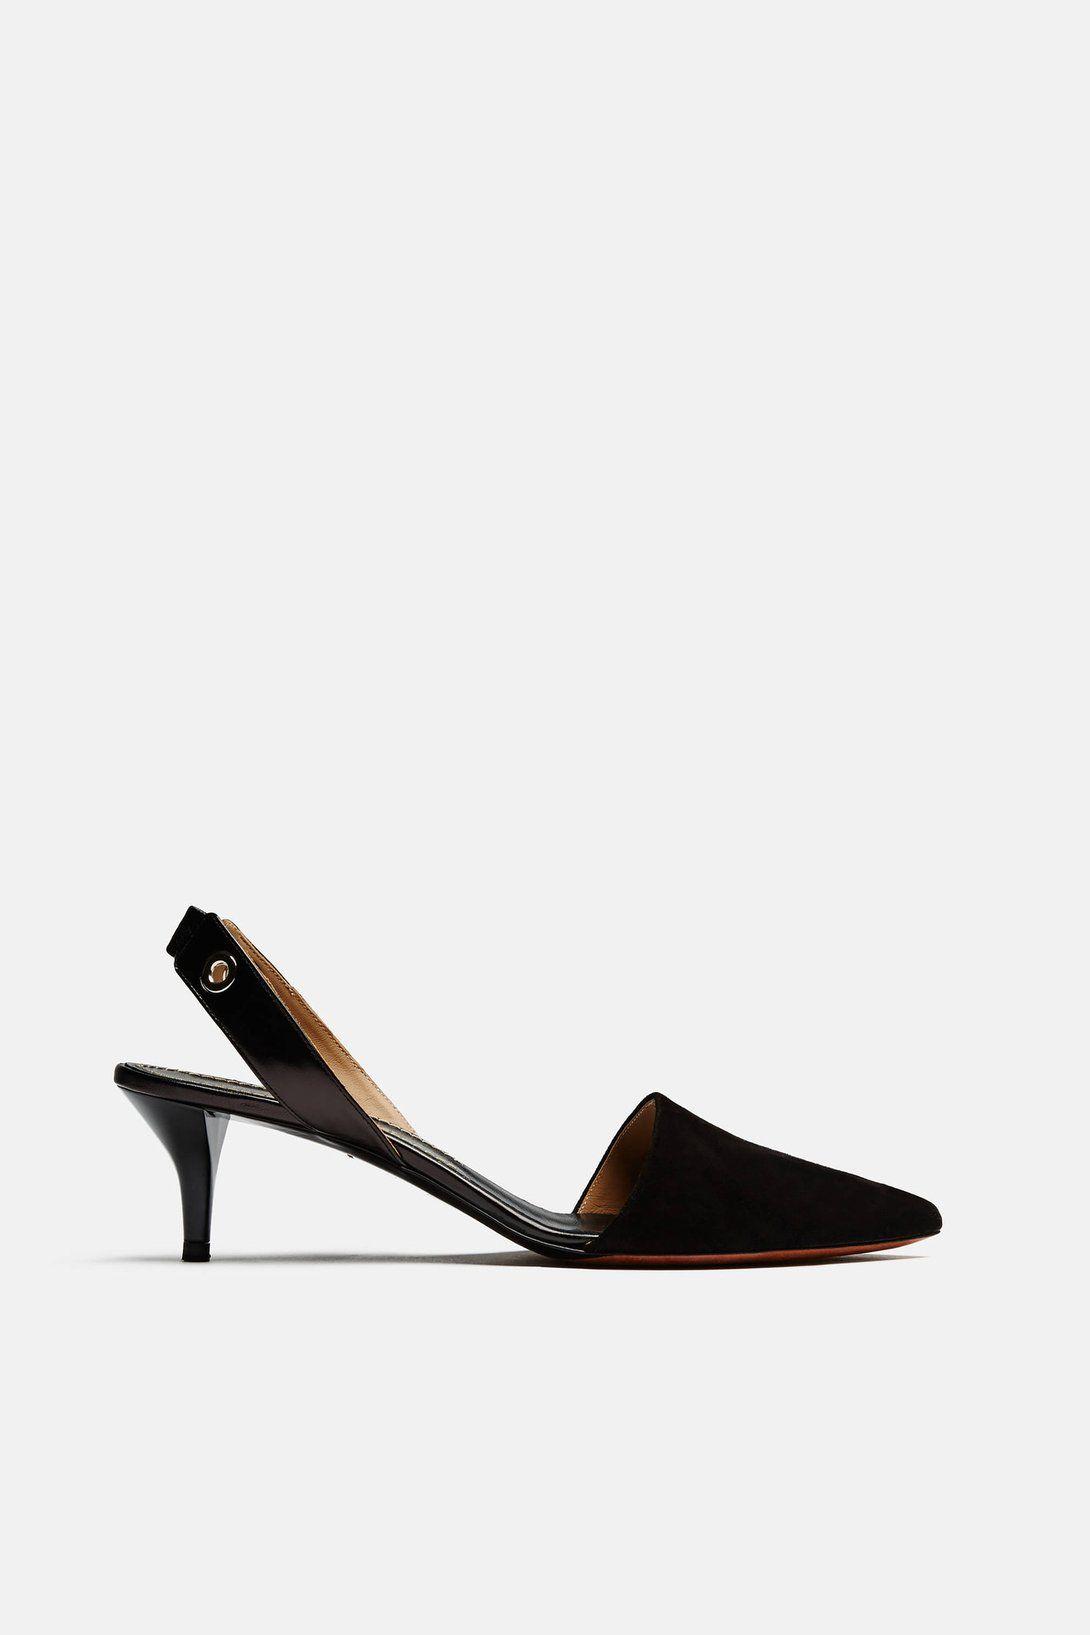 Suede Sling Back Kitten Heel – Black